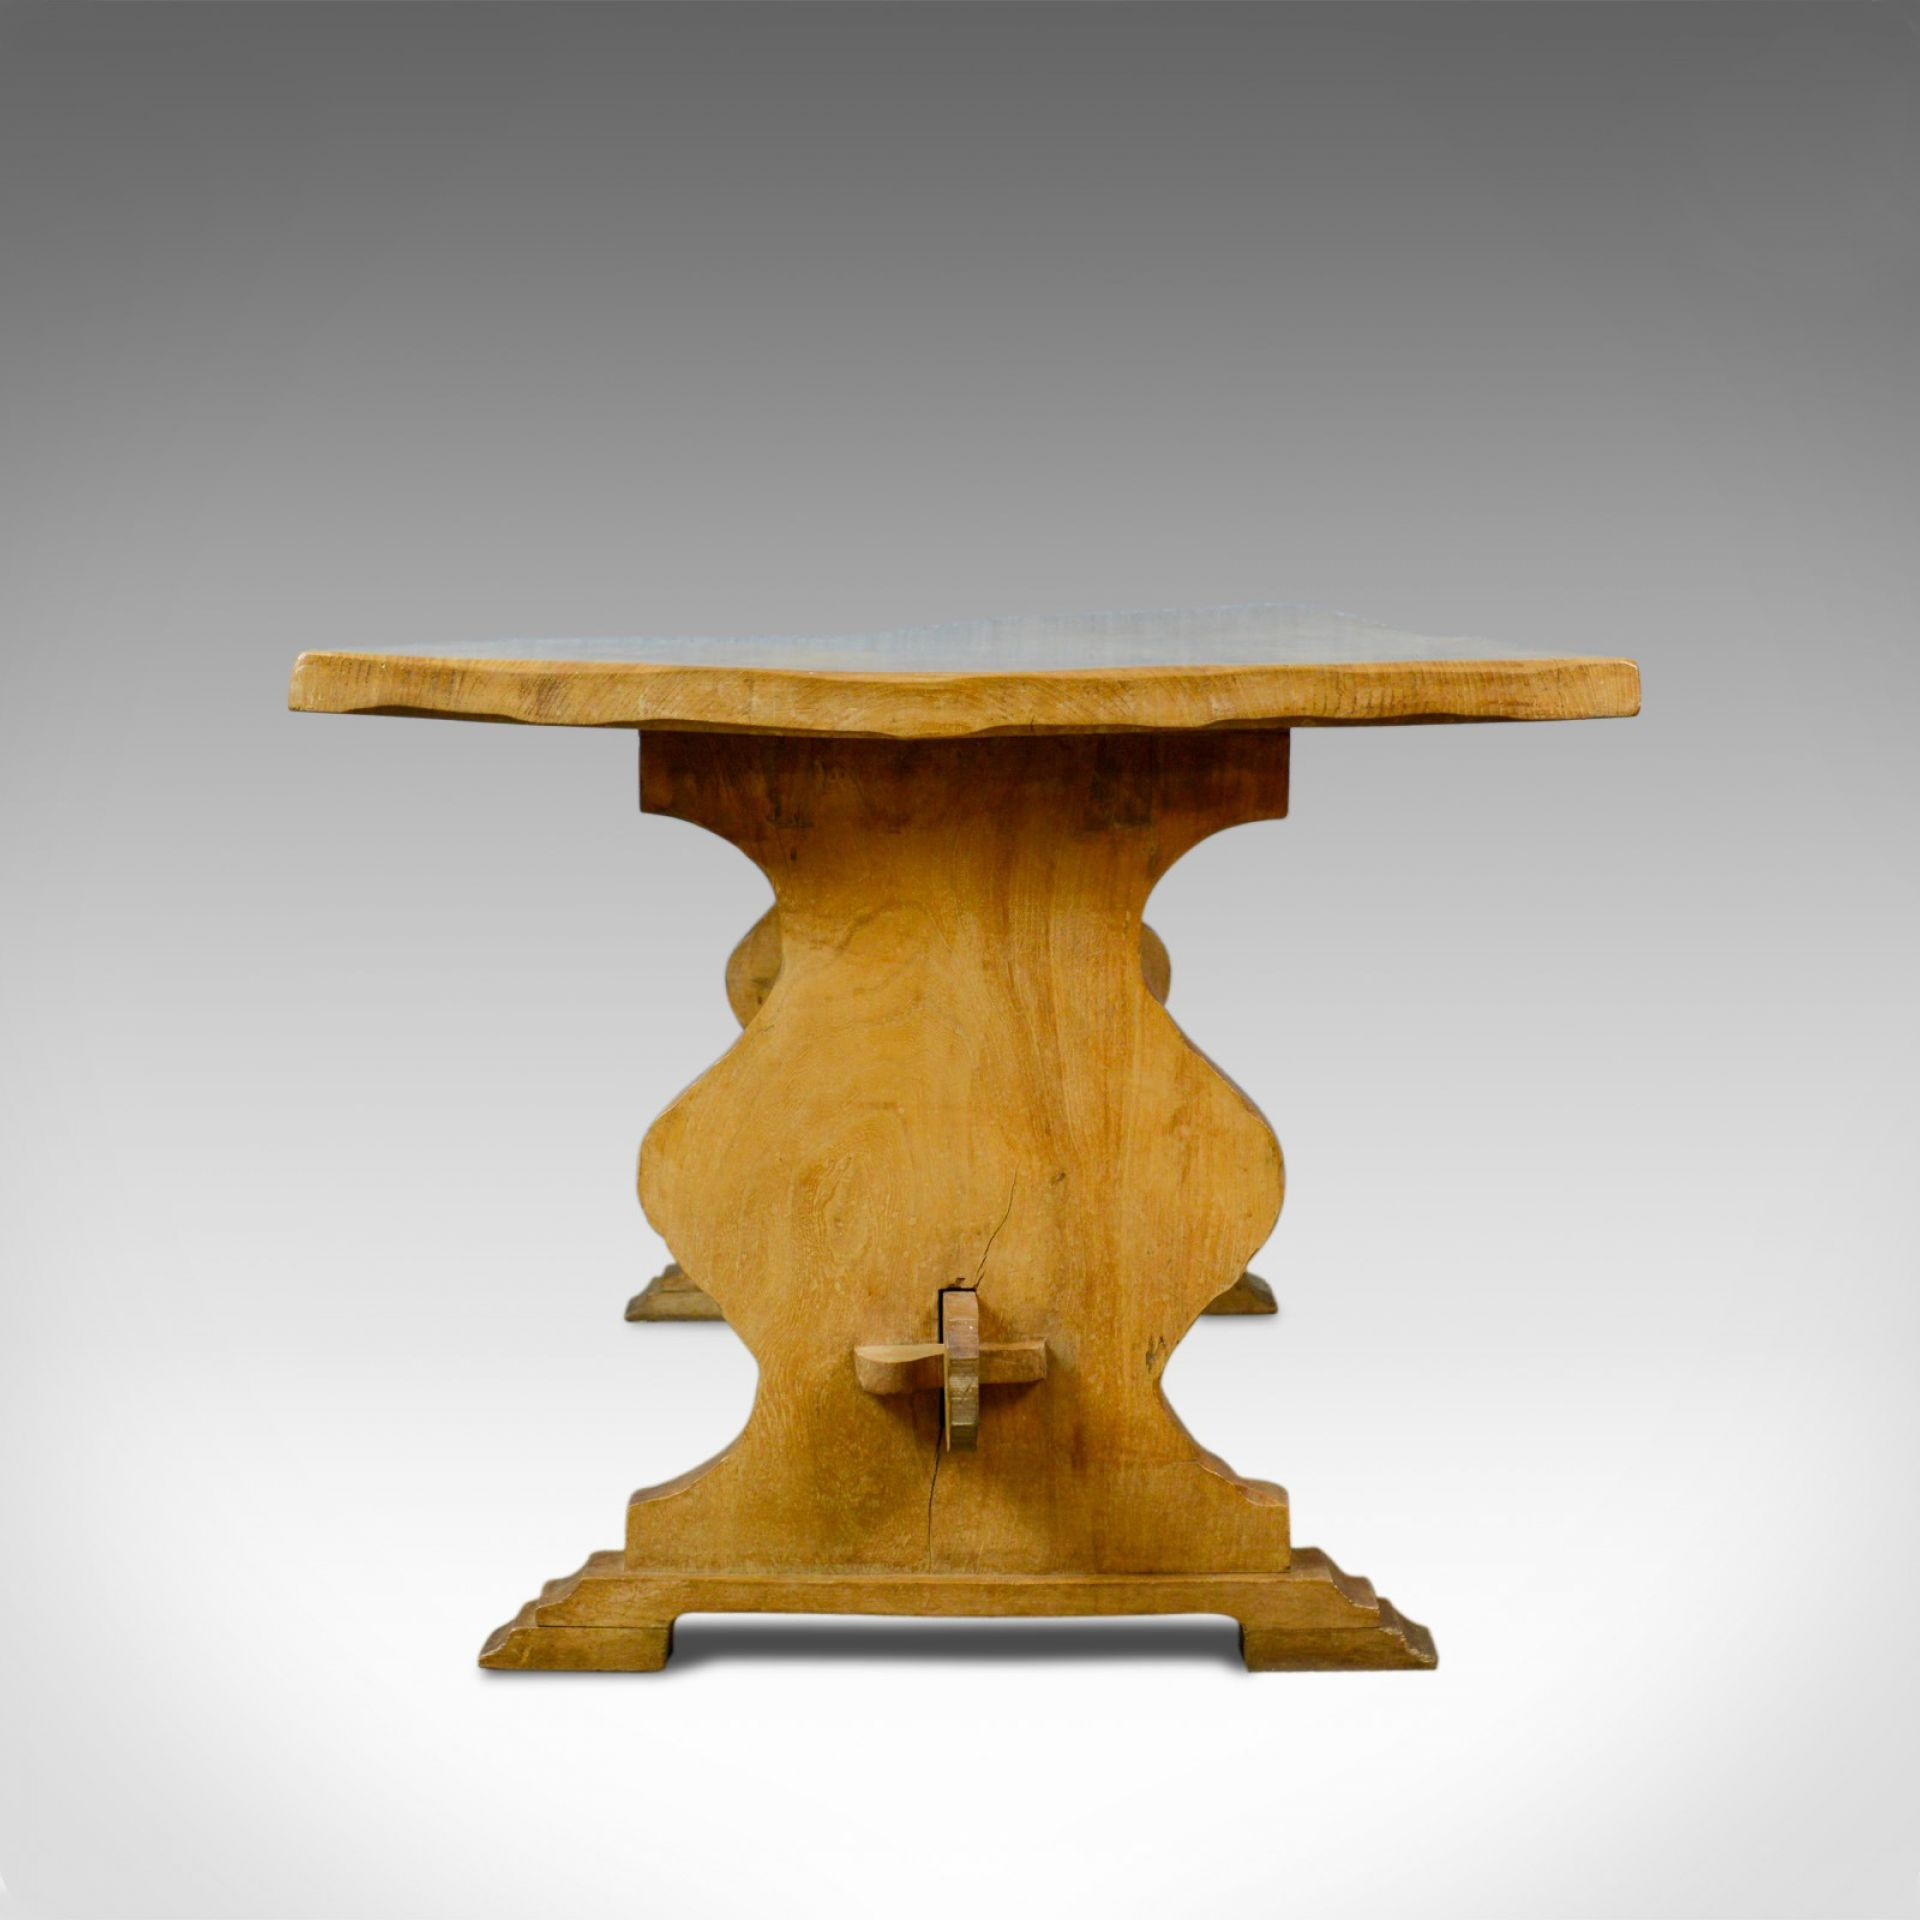 Antique Refectory Dining Table, English, Farmhouse, Elm, Victorian, Circa 1900